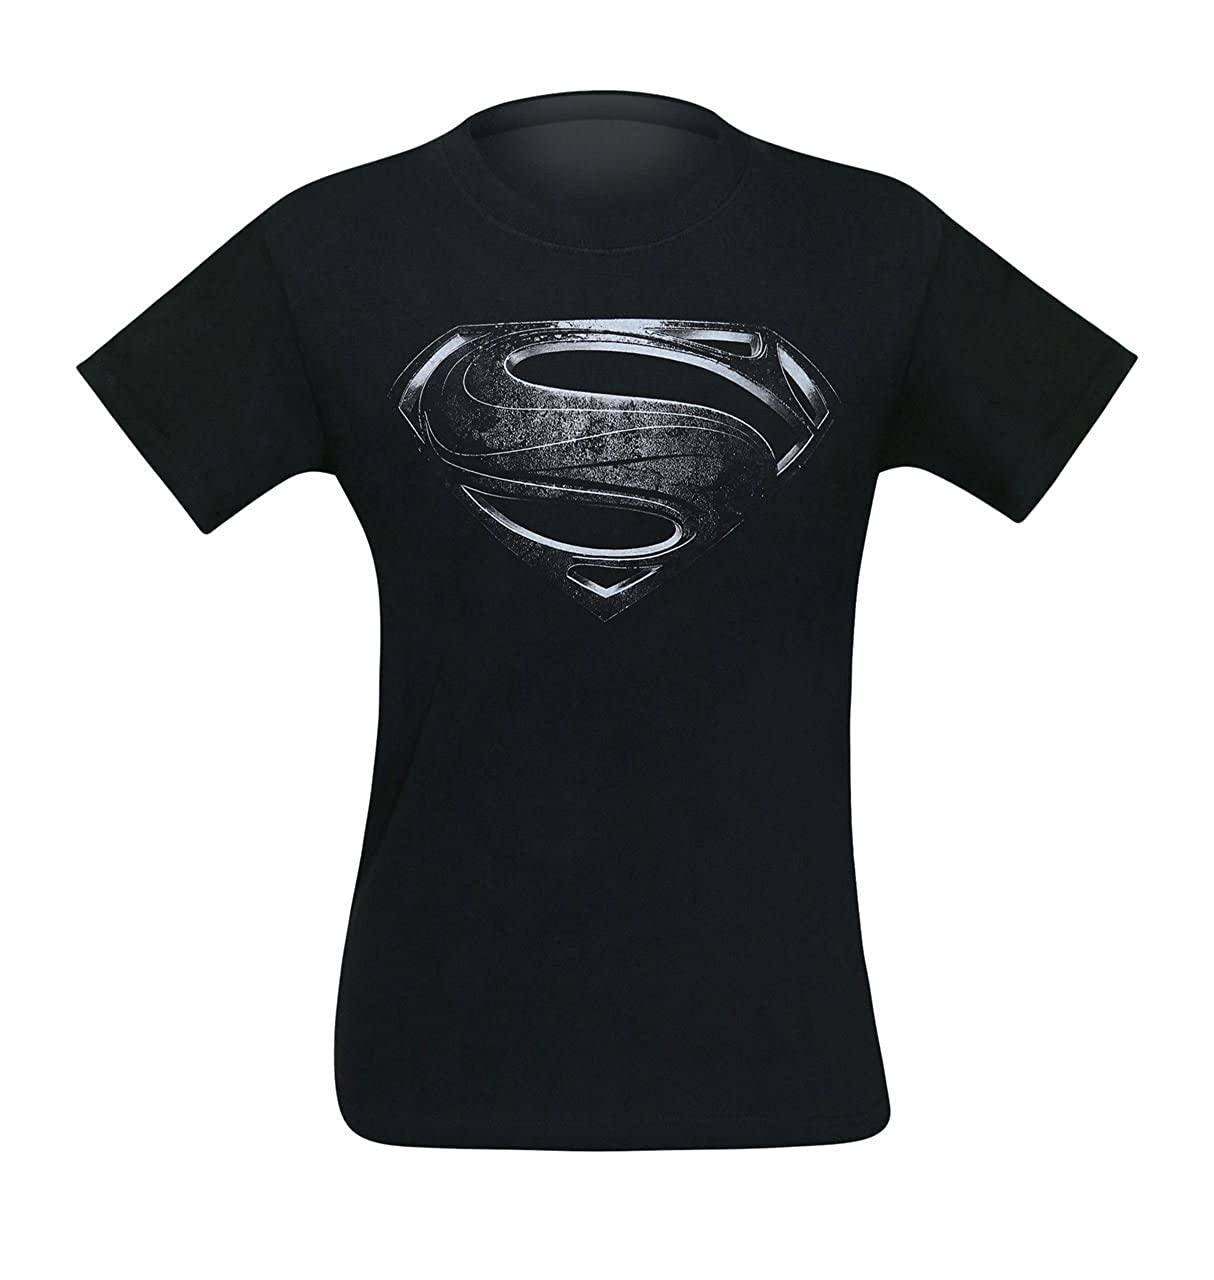 7562c0180f9 Amazon.com  Bioworld Superman Silver Movie Symbol Men s T-Shirt  Clothing